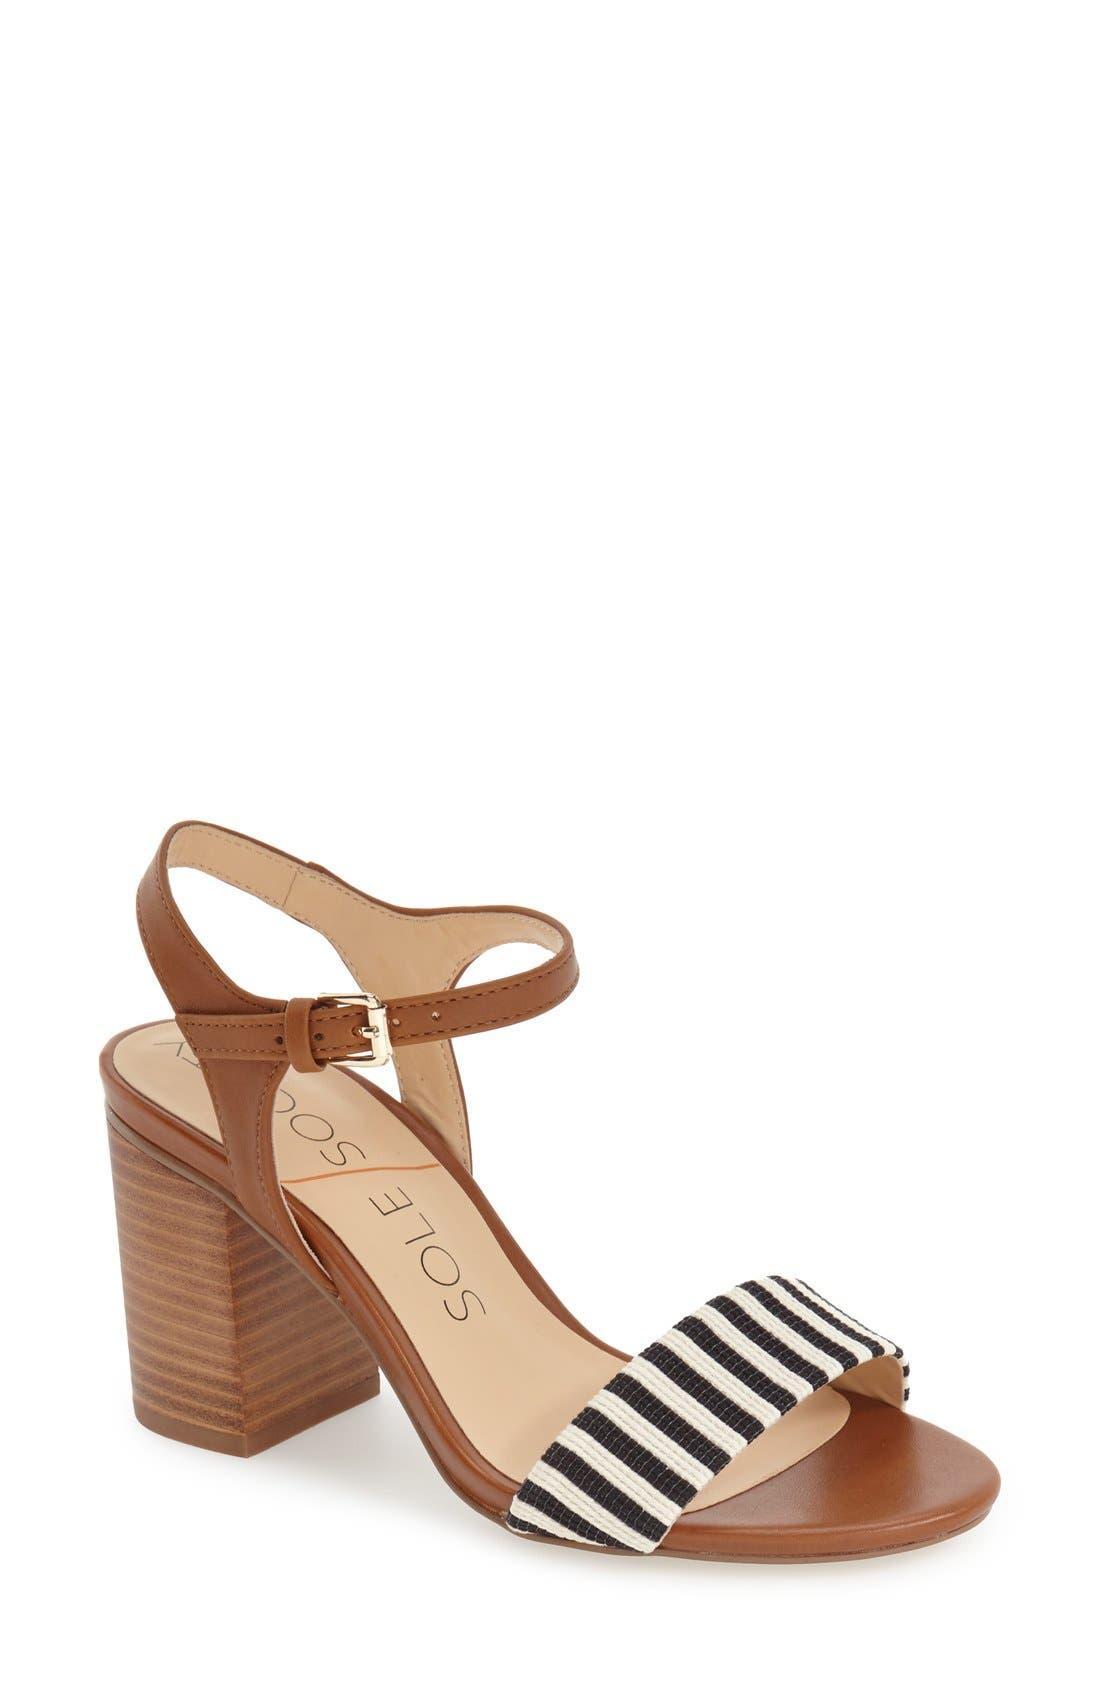 'Linny' Ankle Strap Sandal,                             Main thumbnail 1, color,